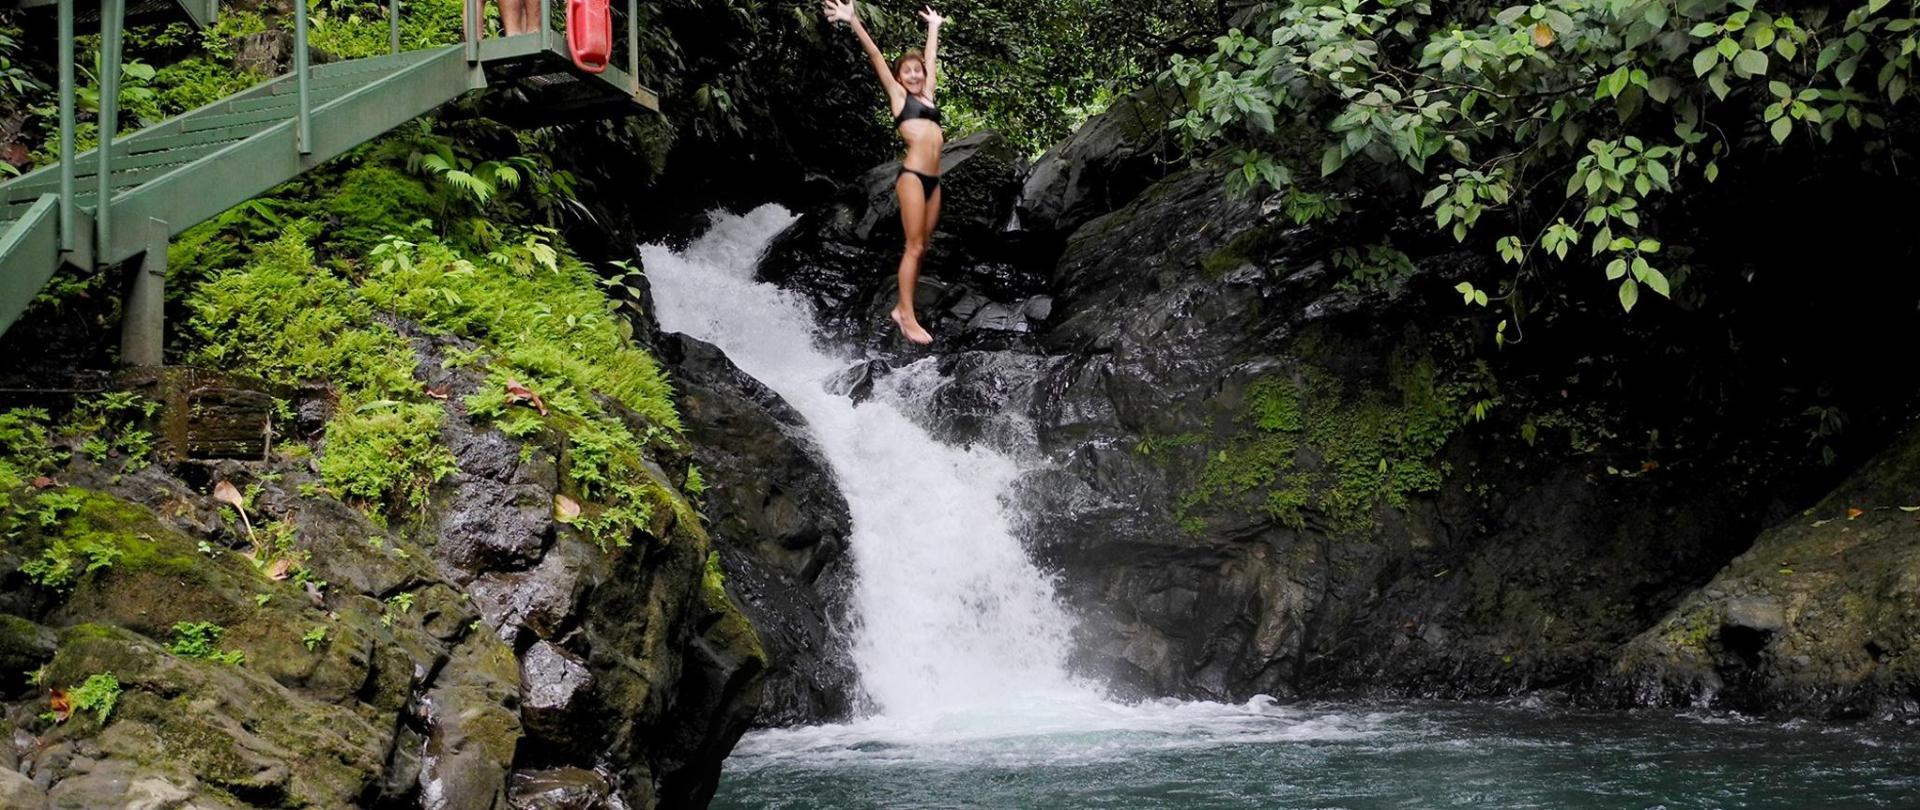 SJ Rio Rodeo Waterfalls Hero  copy.jpg